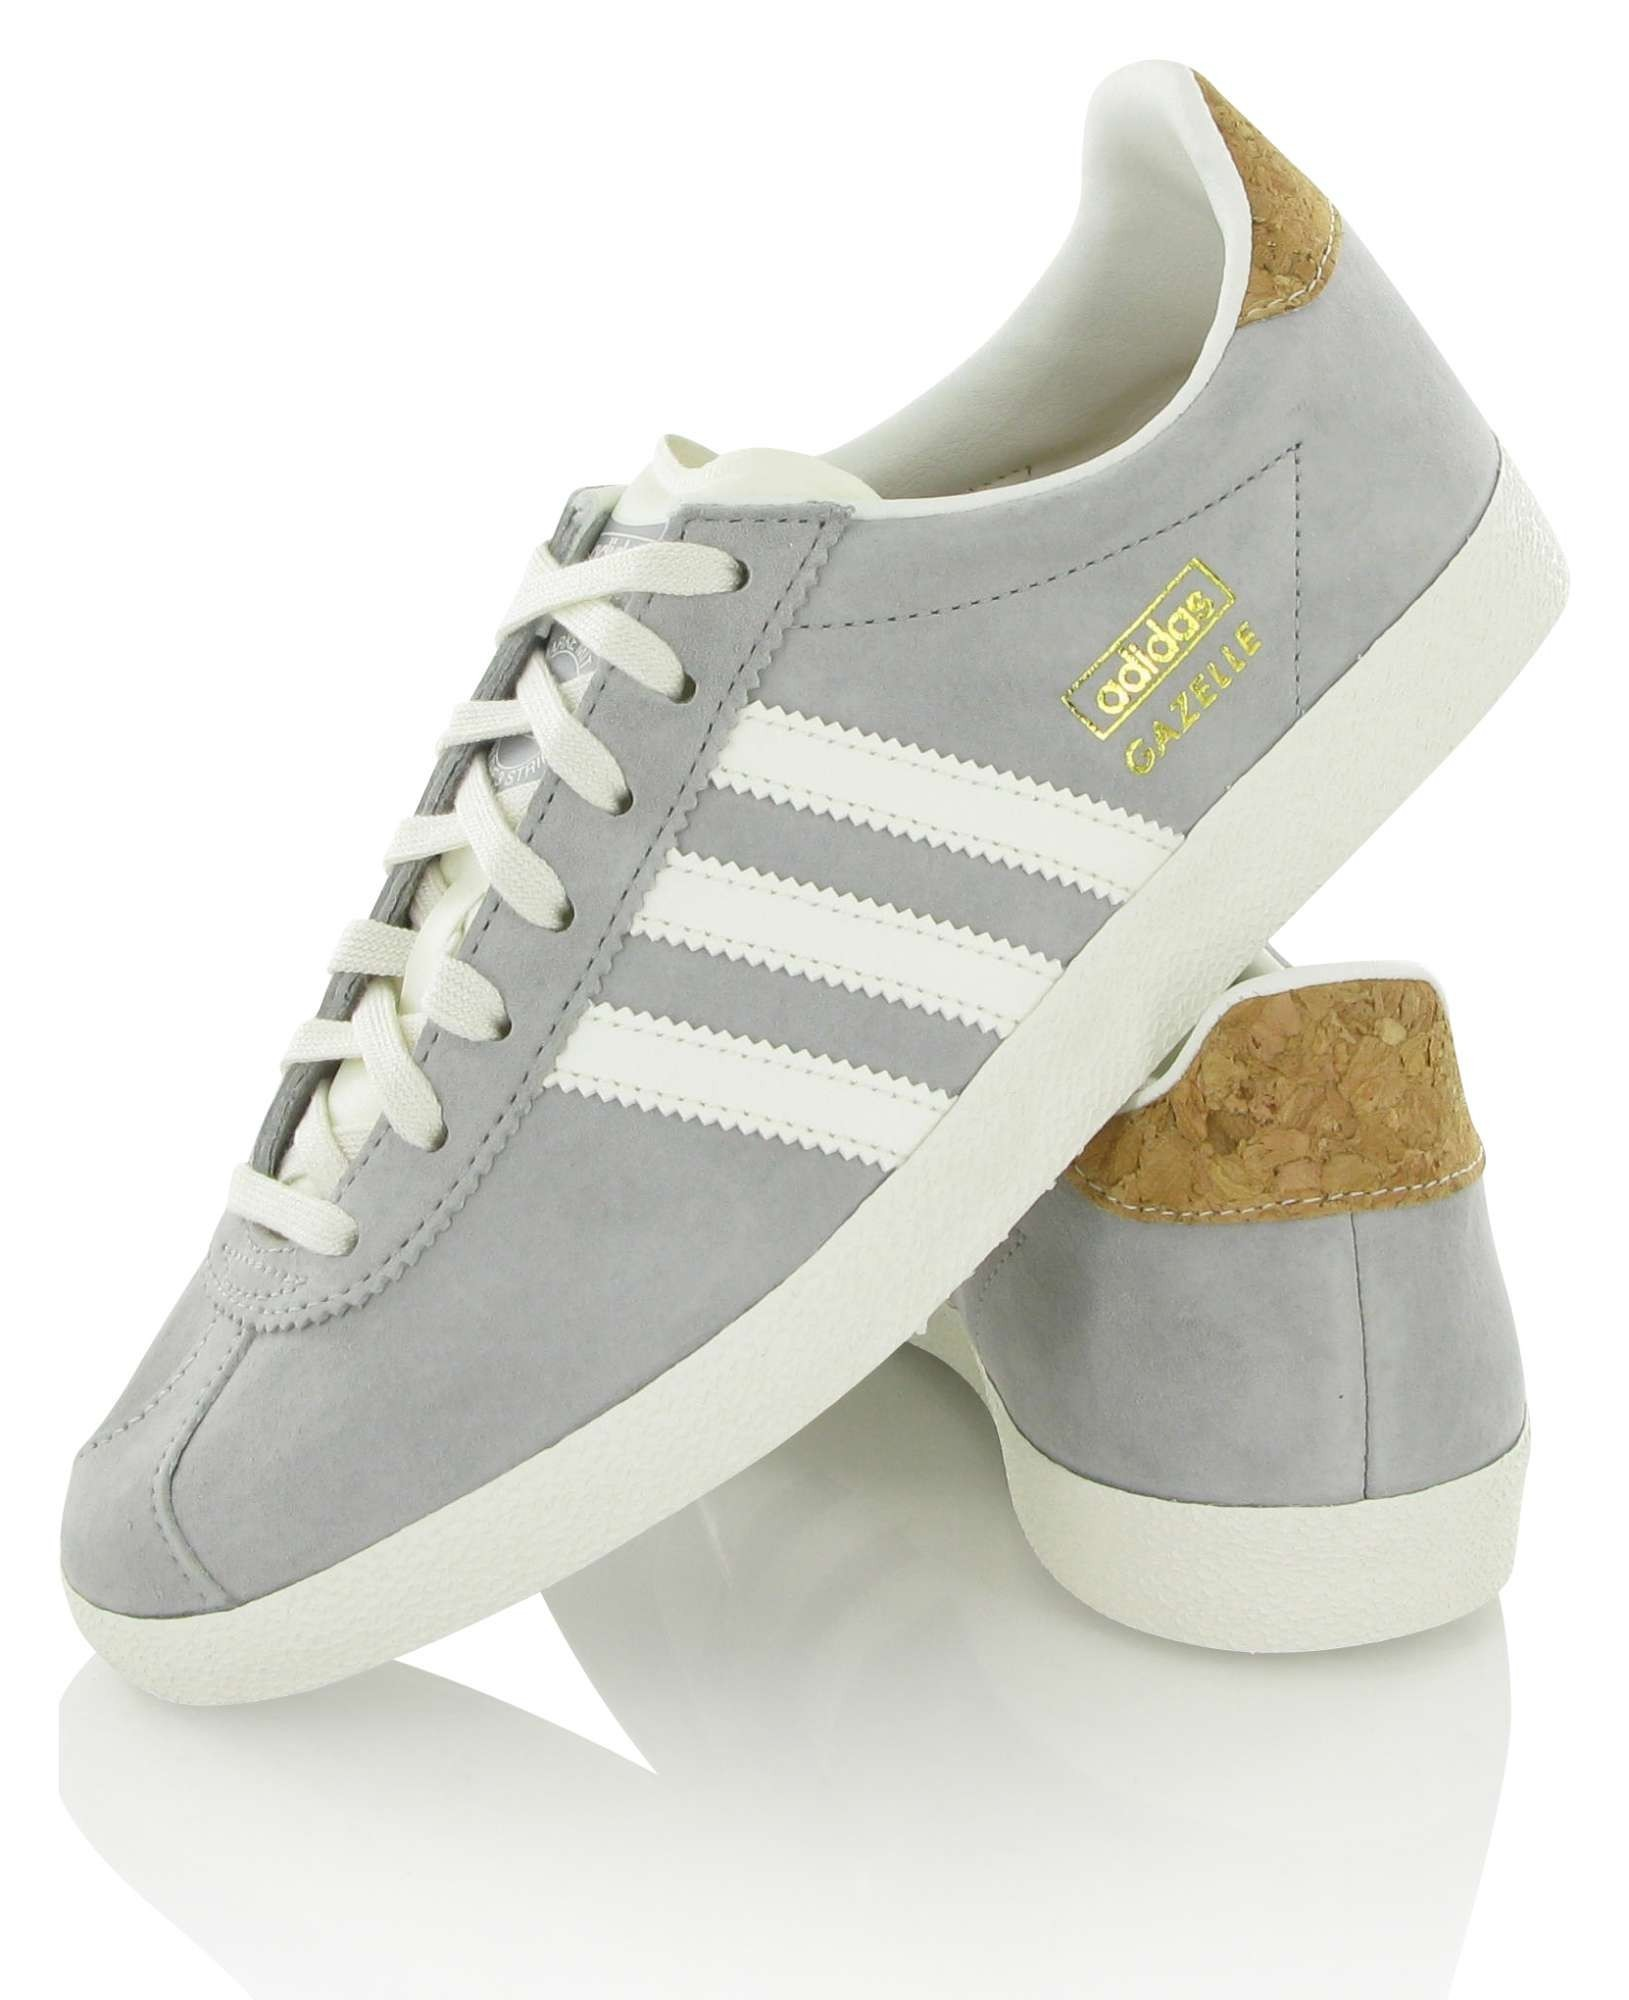 adidas gazelle femmes grise